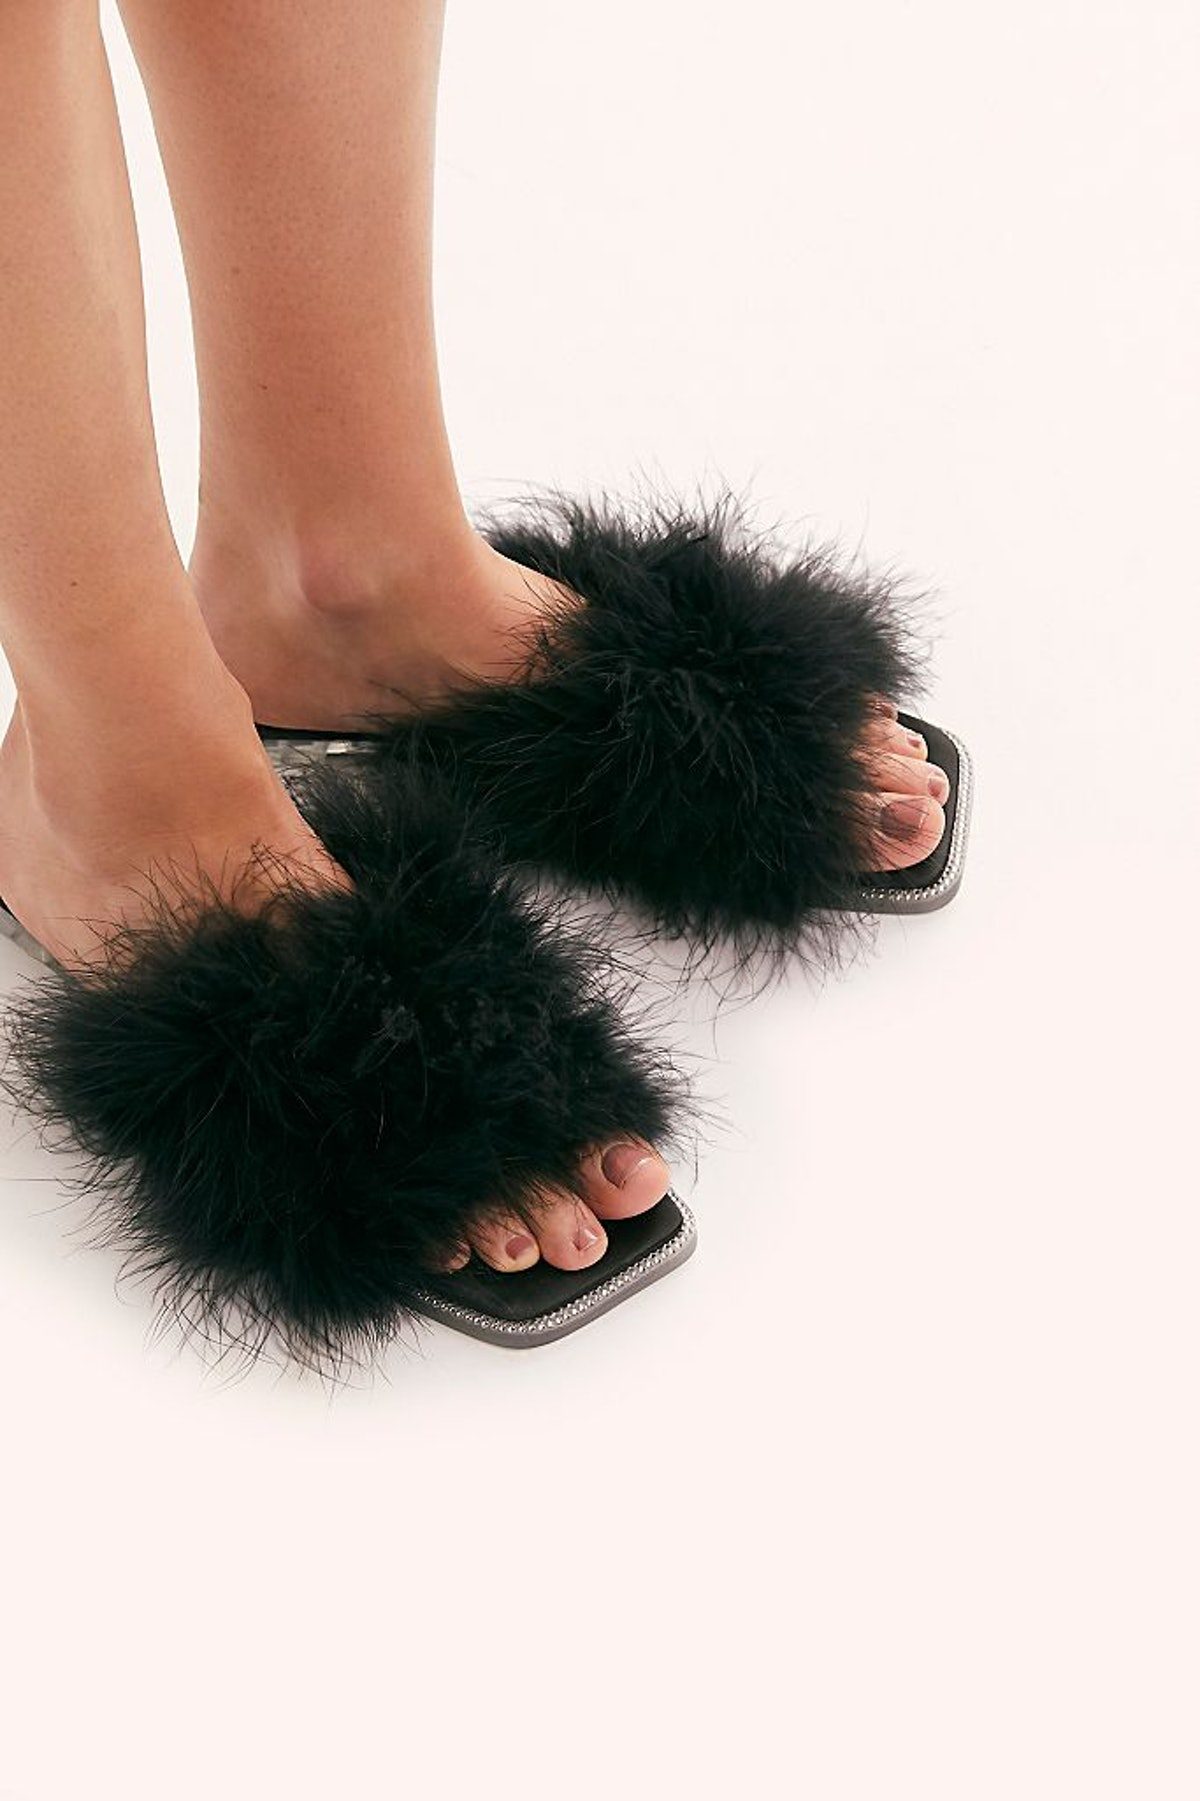 Jeffrey Campbell Crush On You Slide Sandals